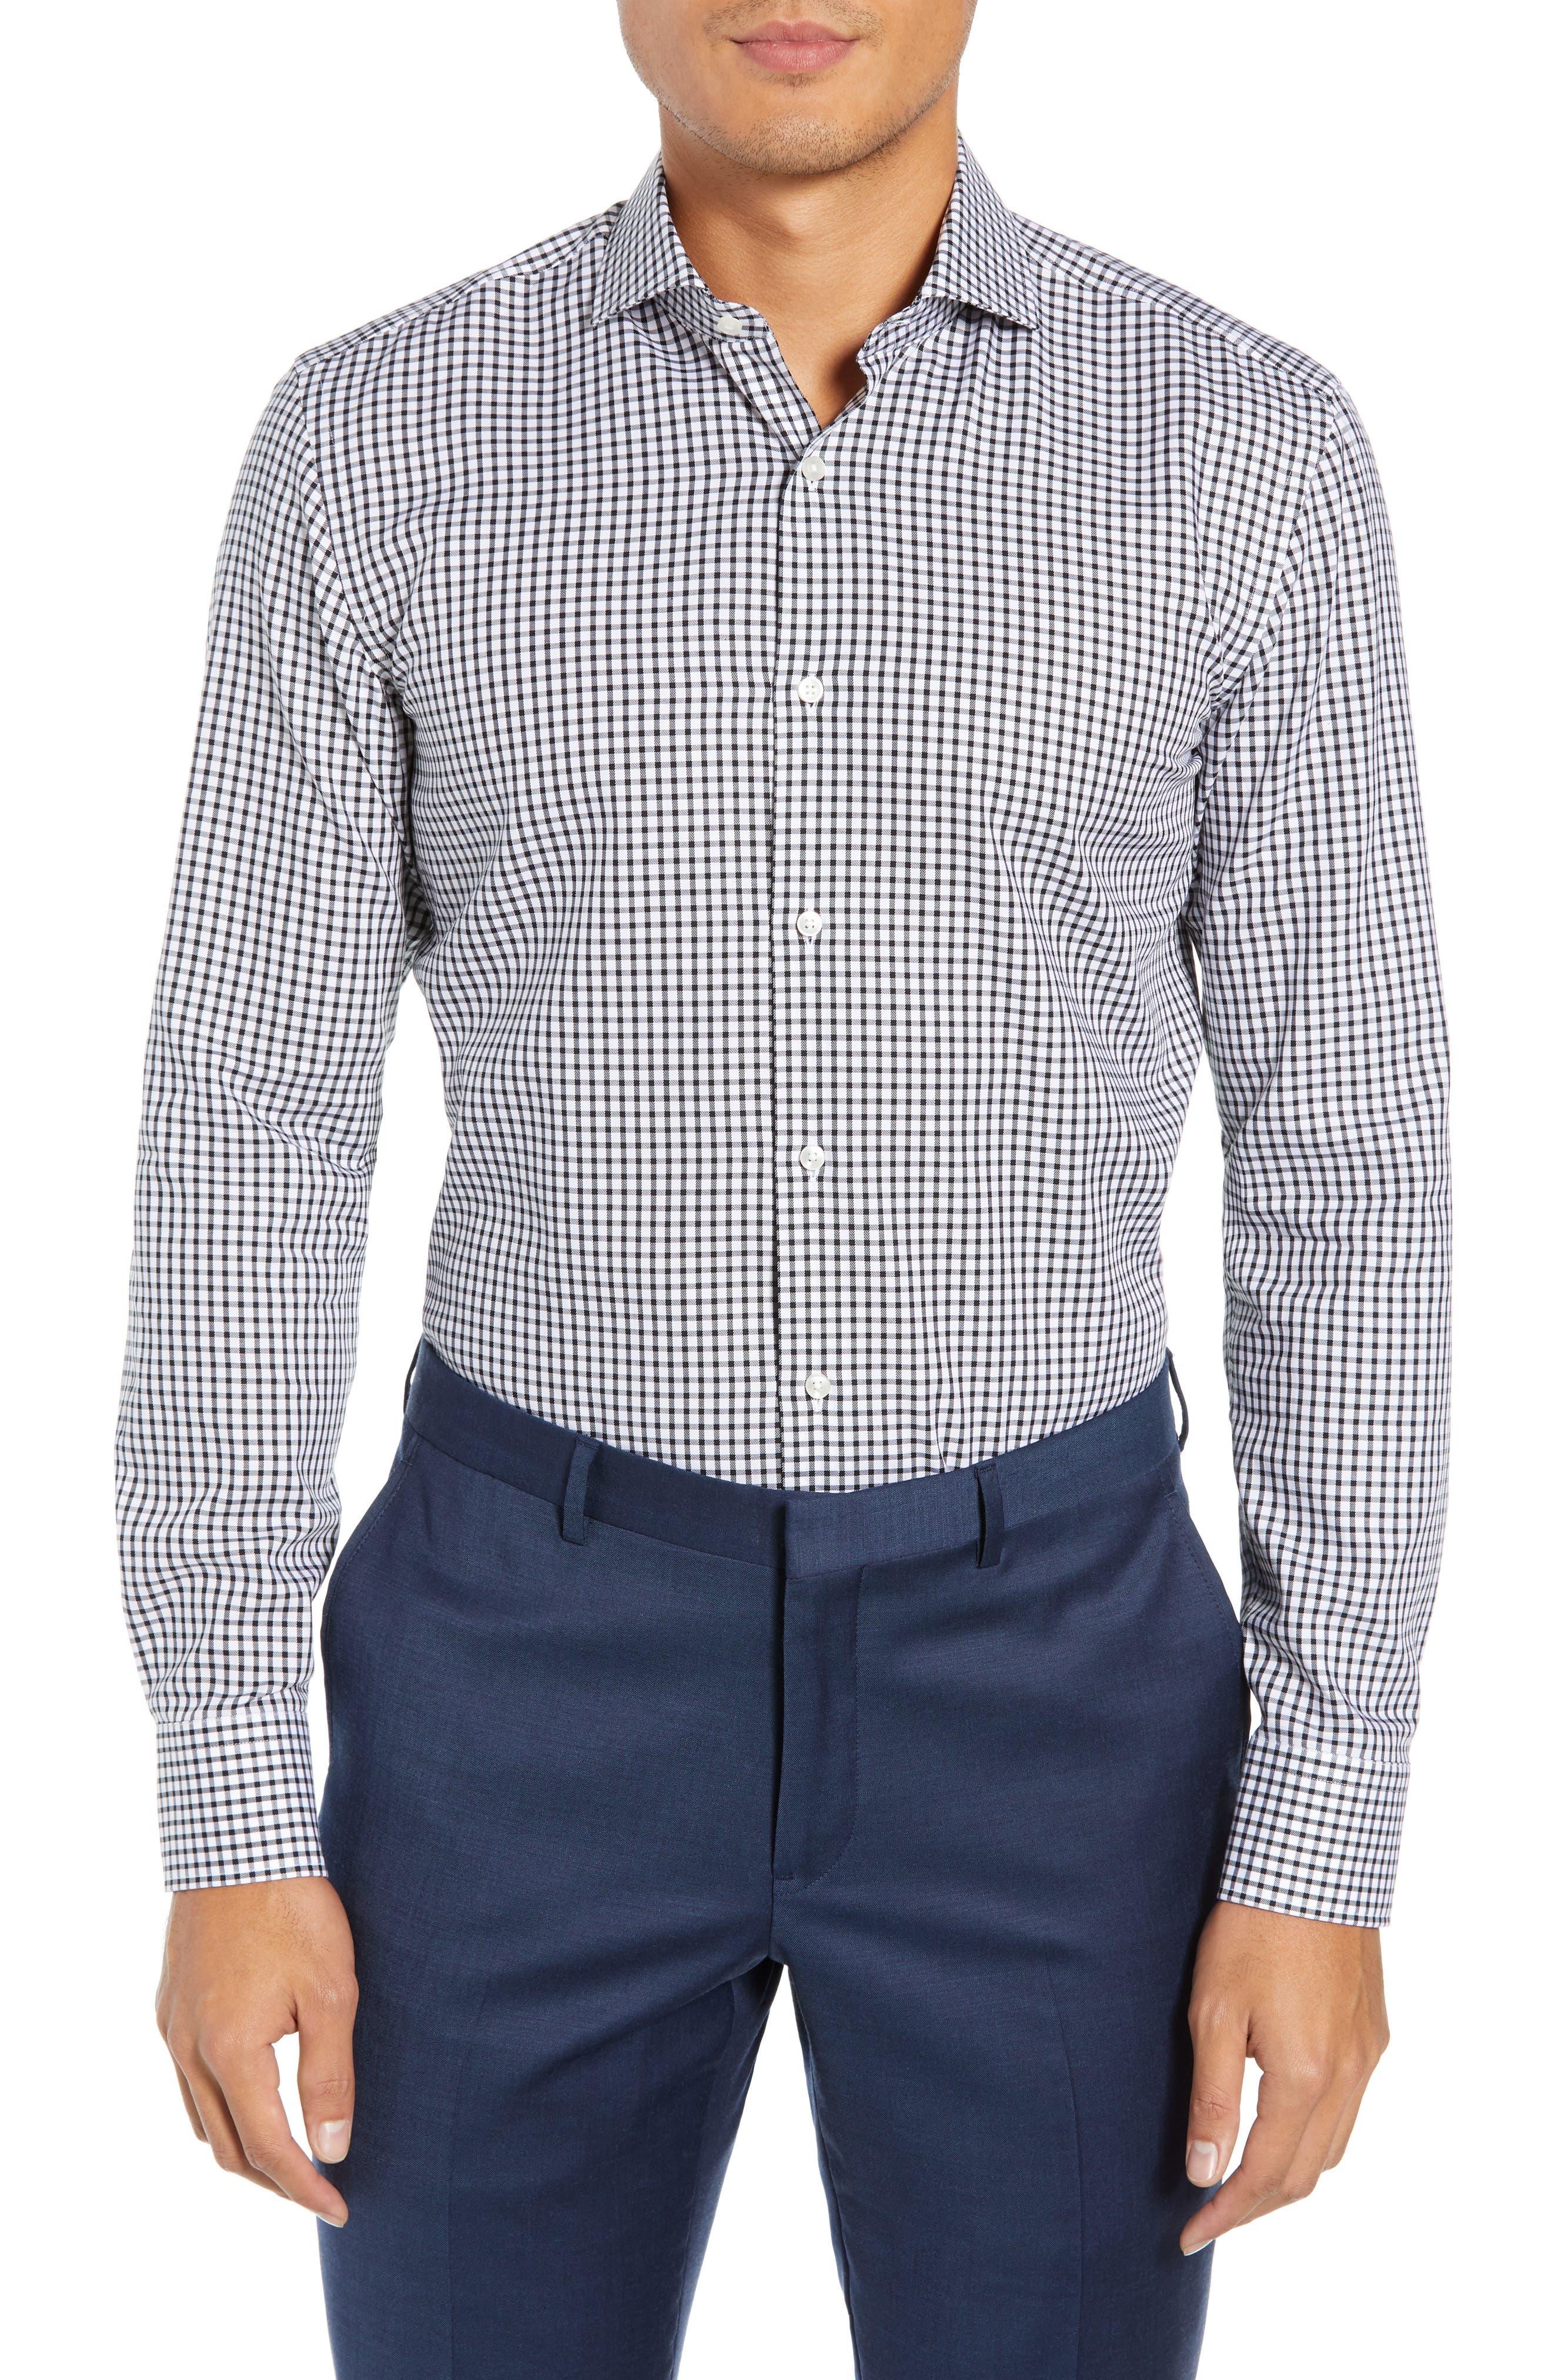 Jason Trim Fit Check Dress Shirt,                         Main,                         color, 002